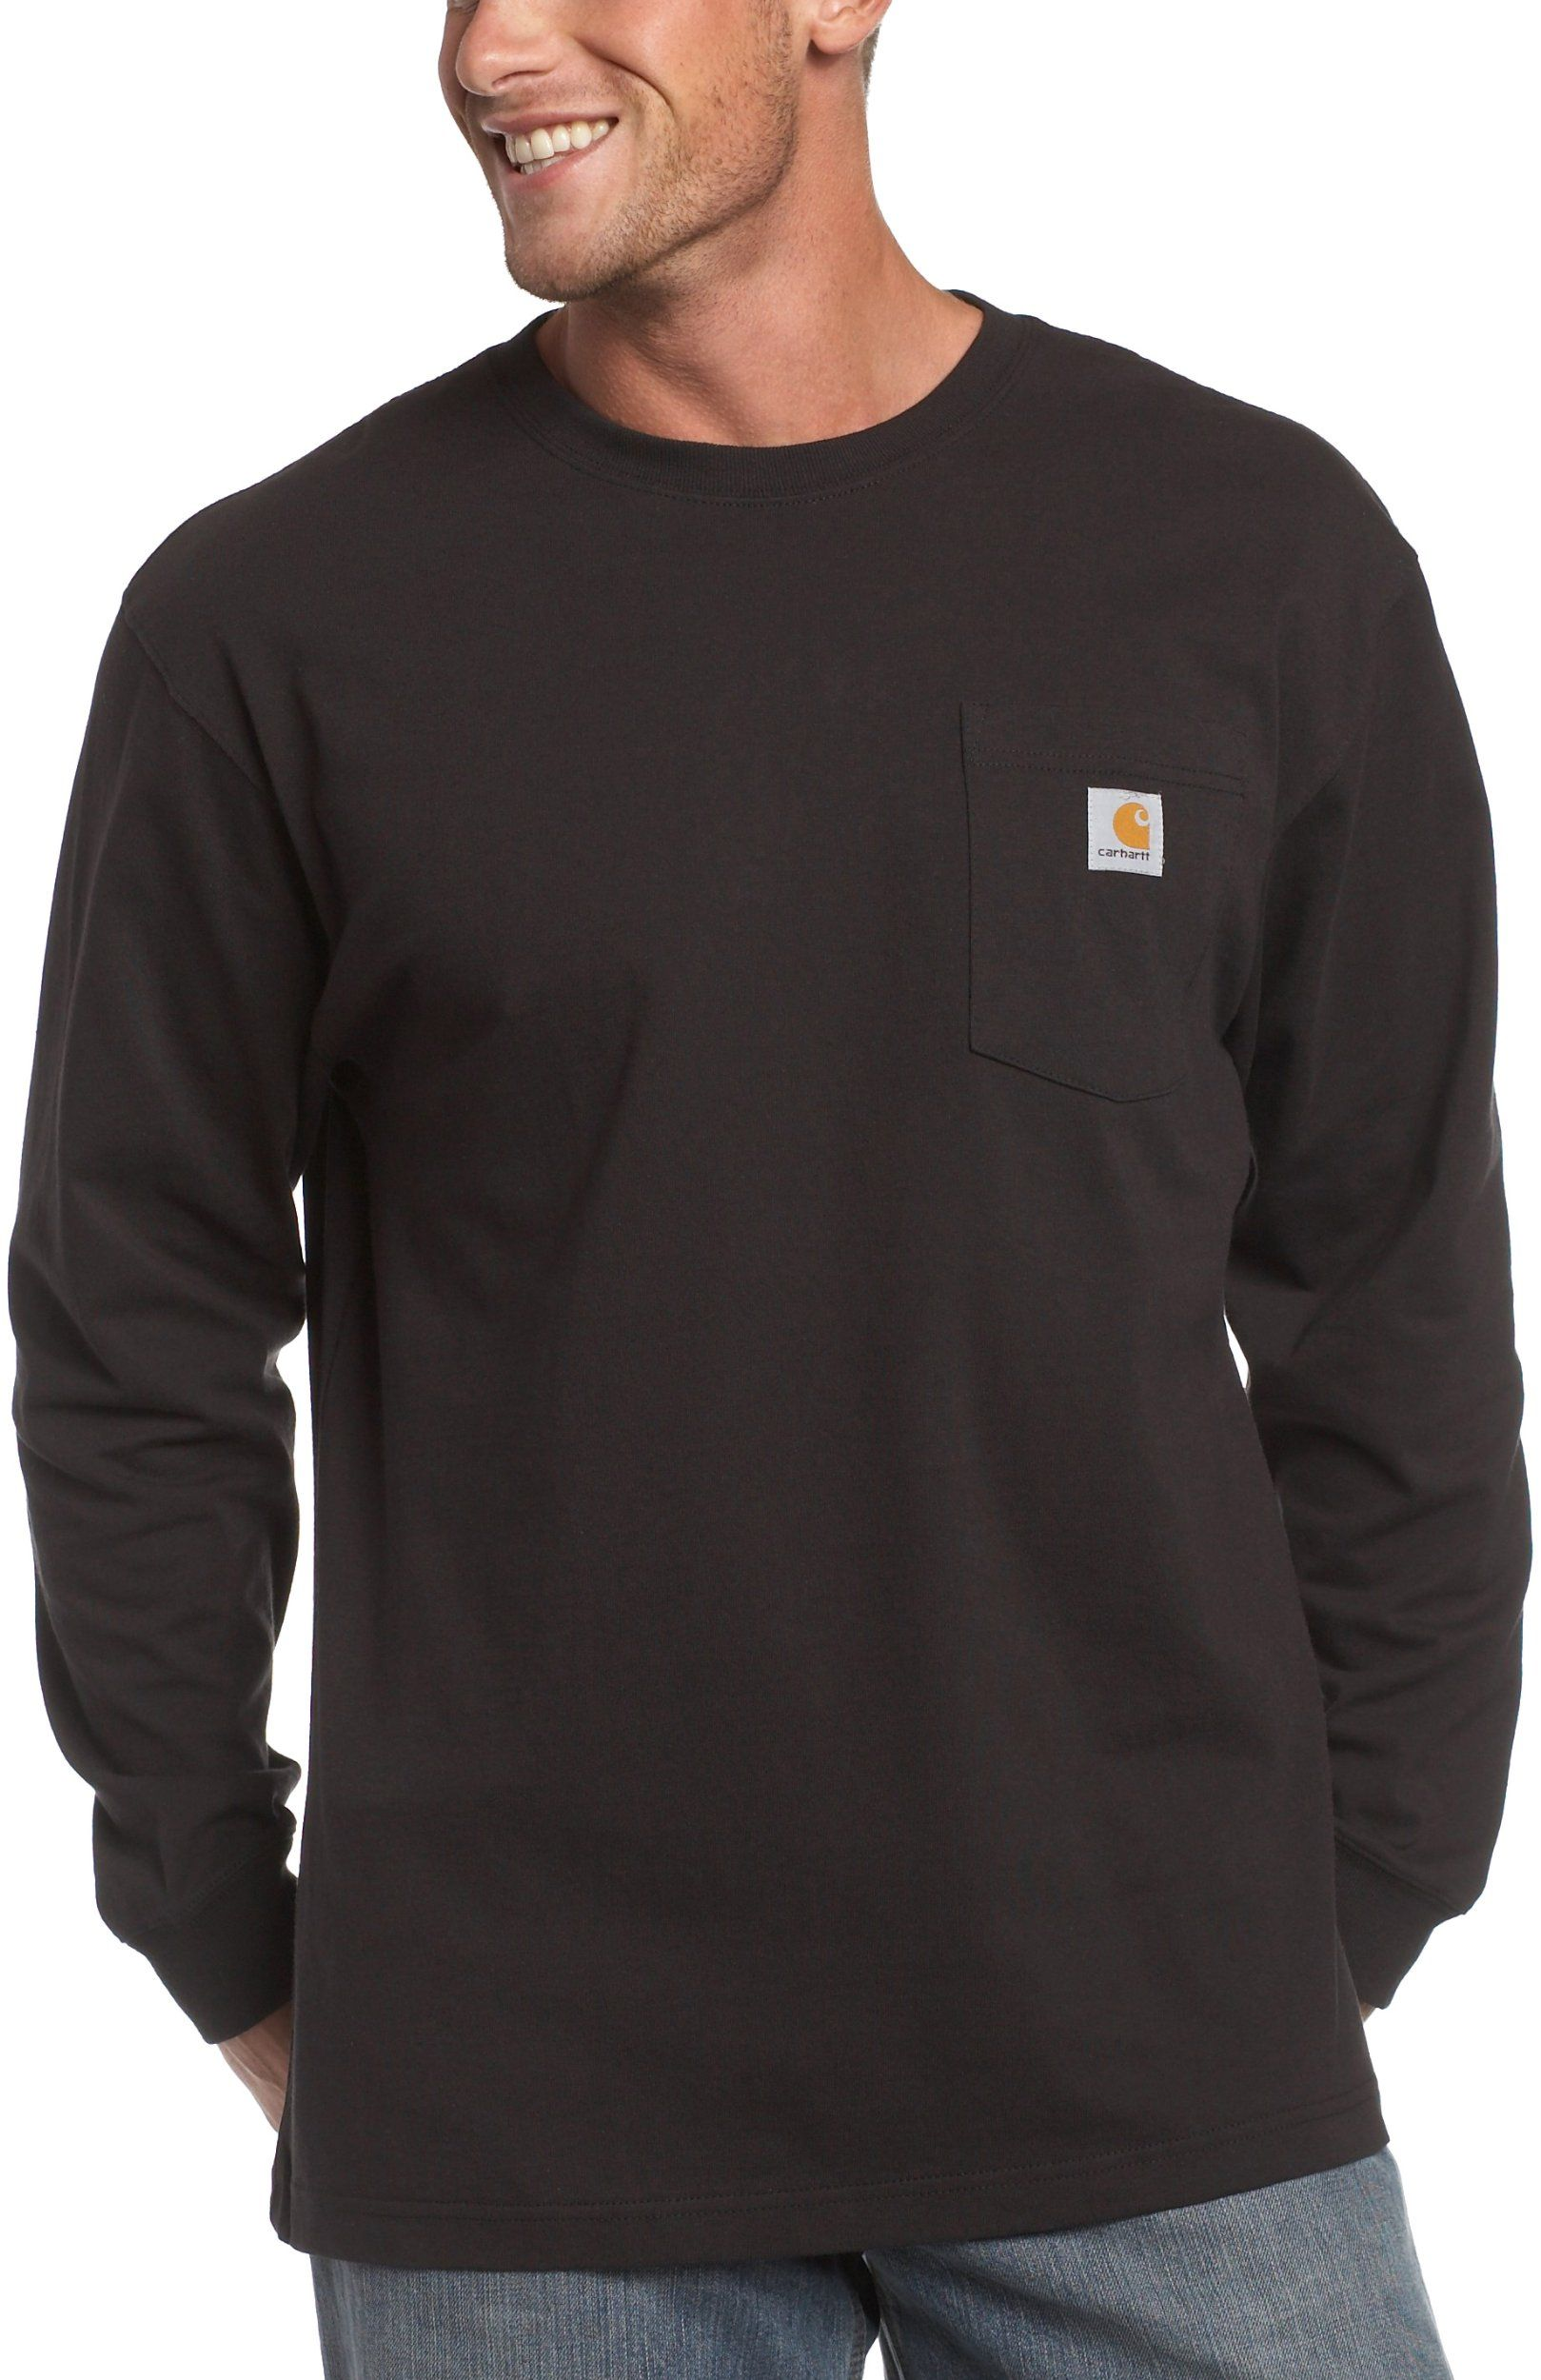 1222e2def3b Amazon.com  Carhartt Men s Workwear Pocket Long Sleeve T Shirt  Work  Utility Shirts  Clothing